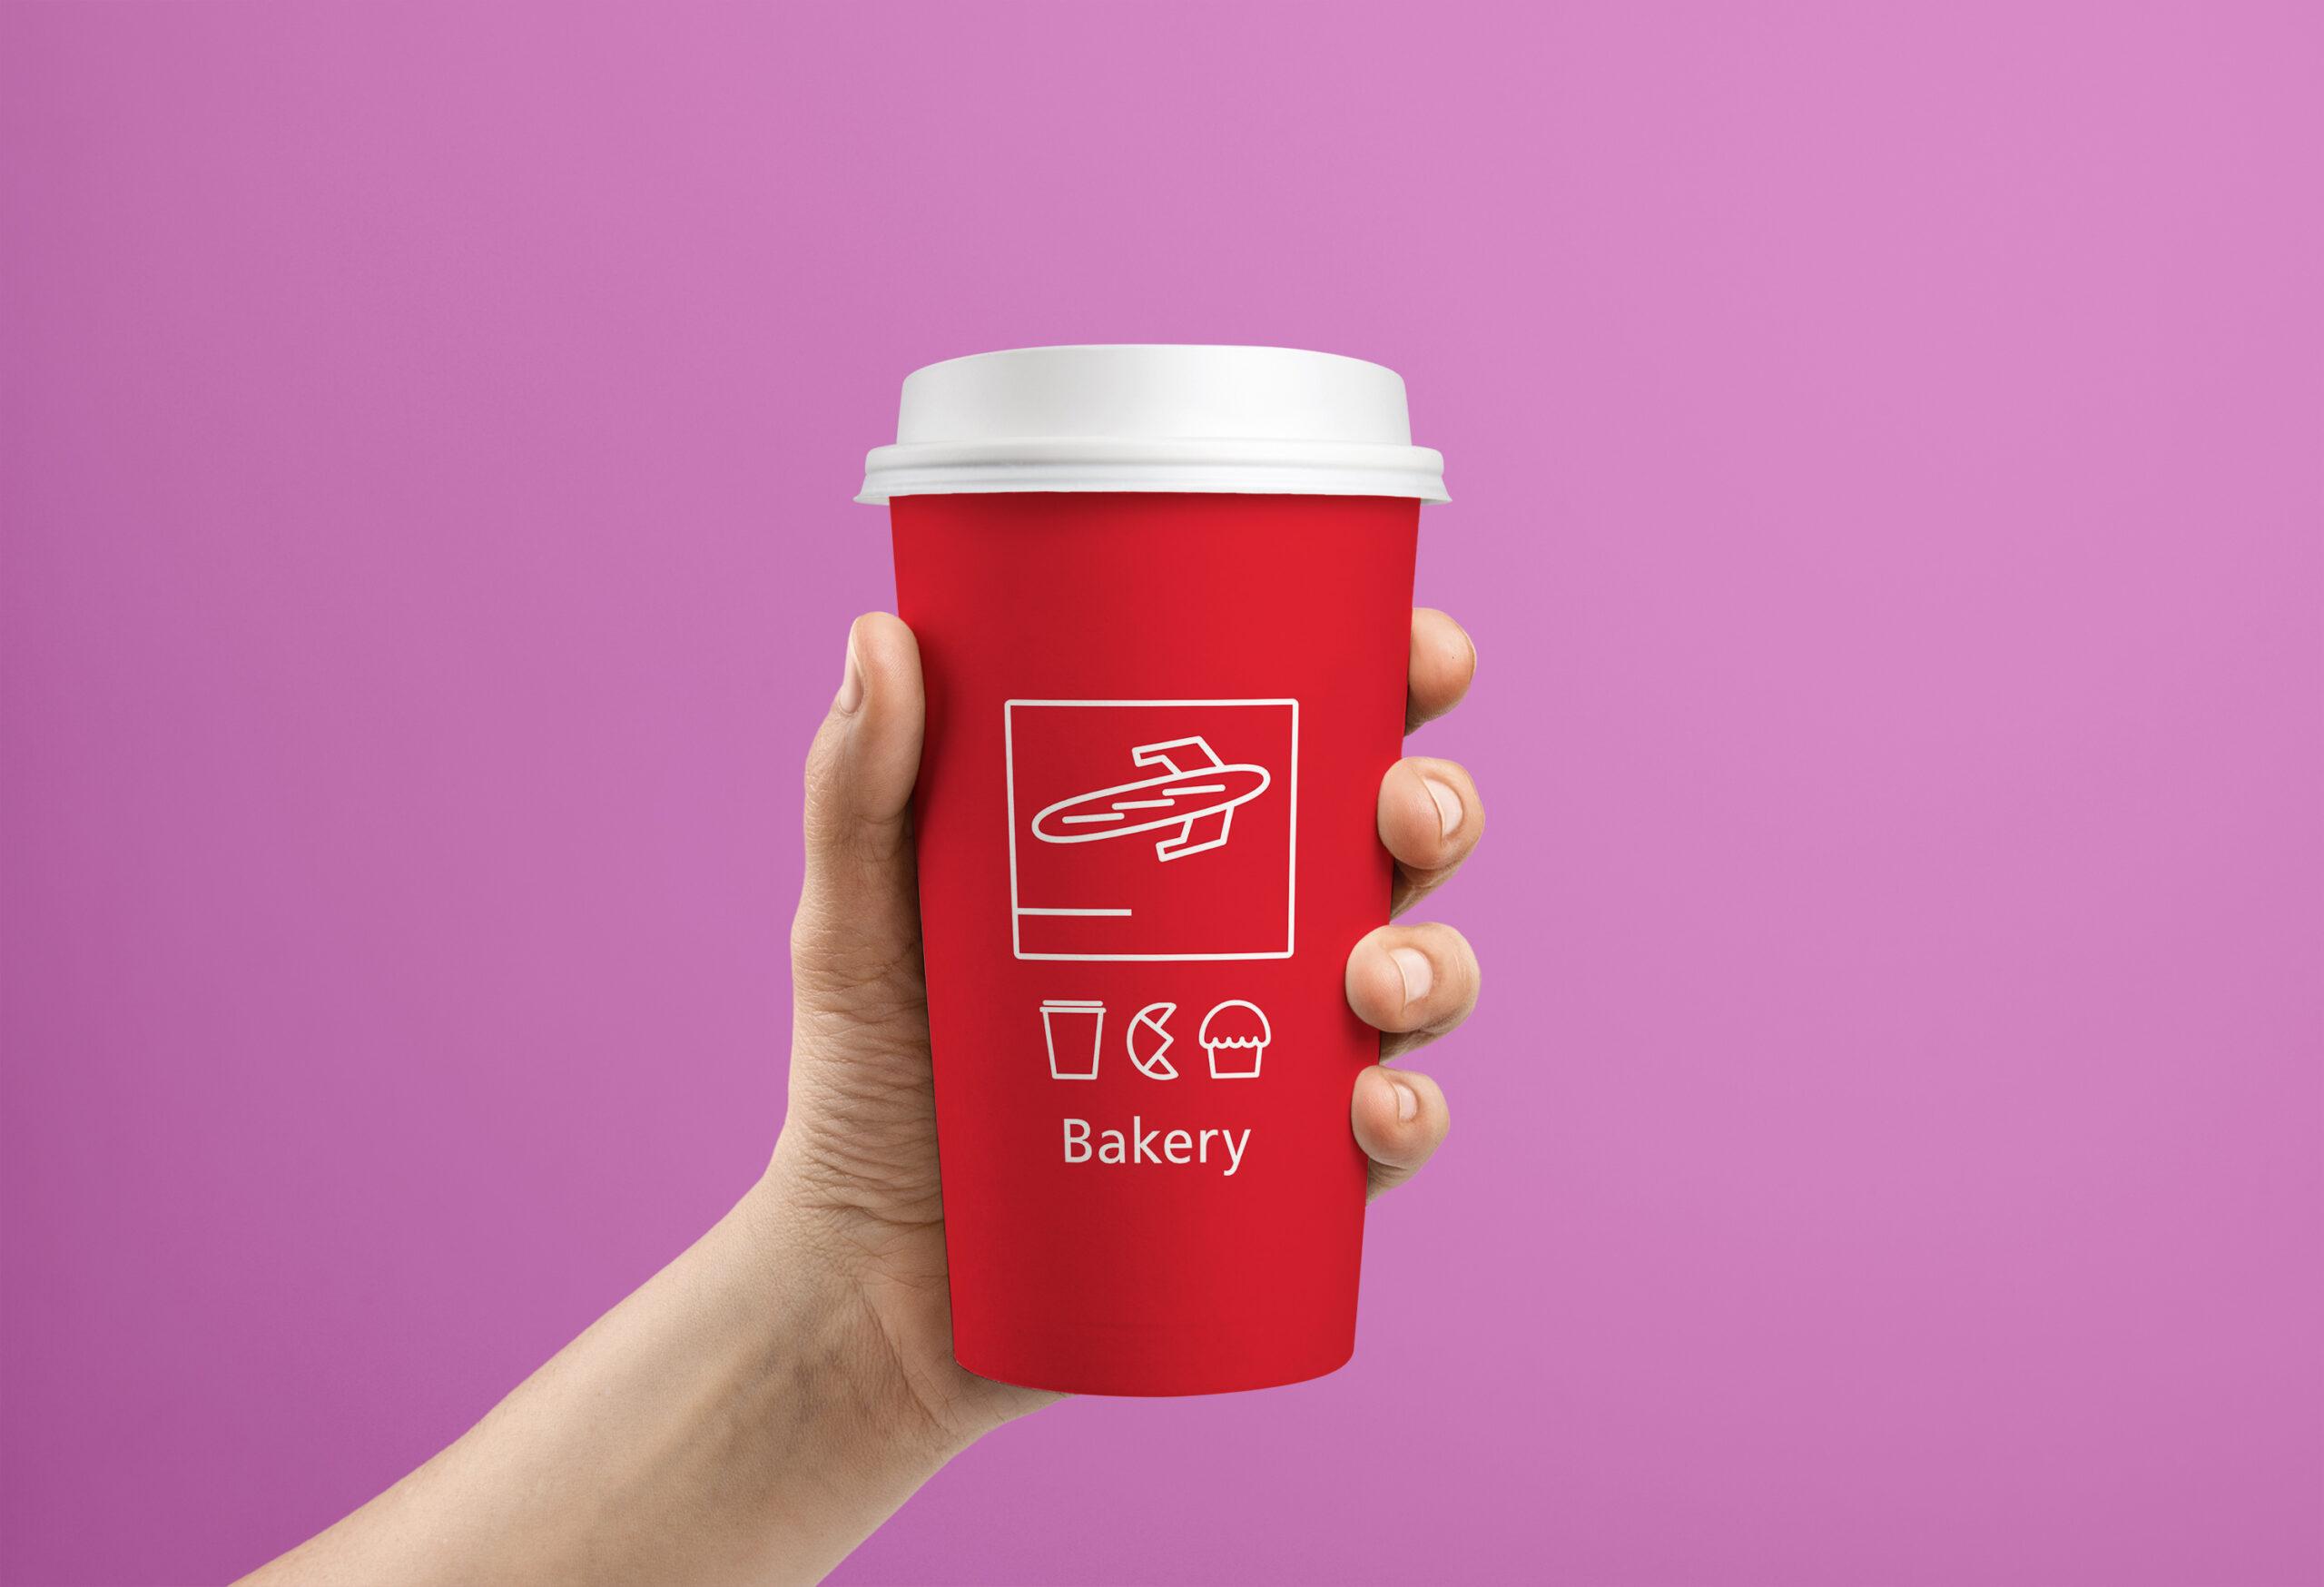 TBB LOGO ON Medium cup